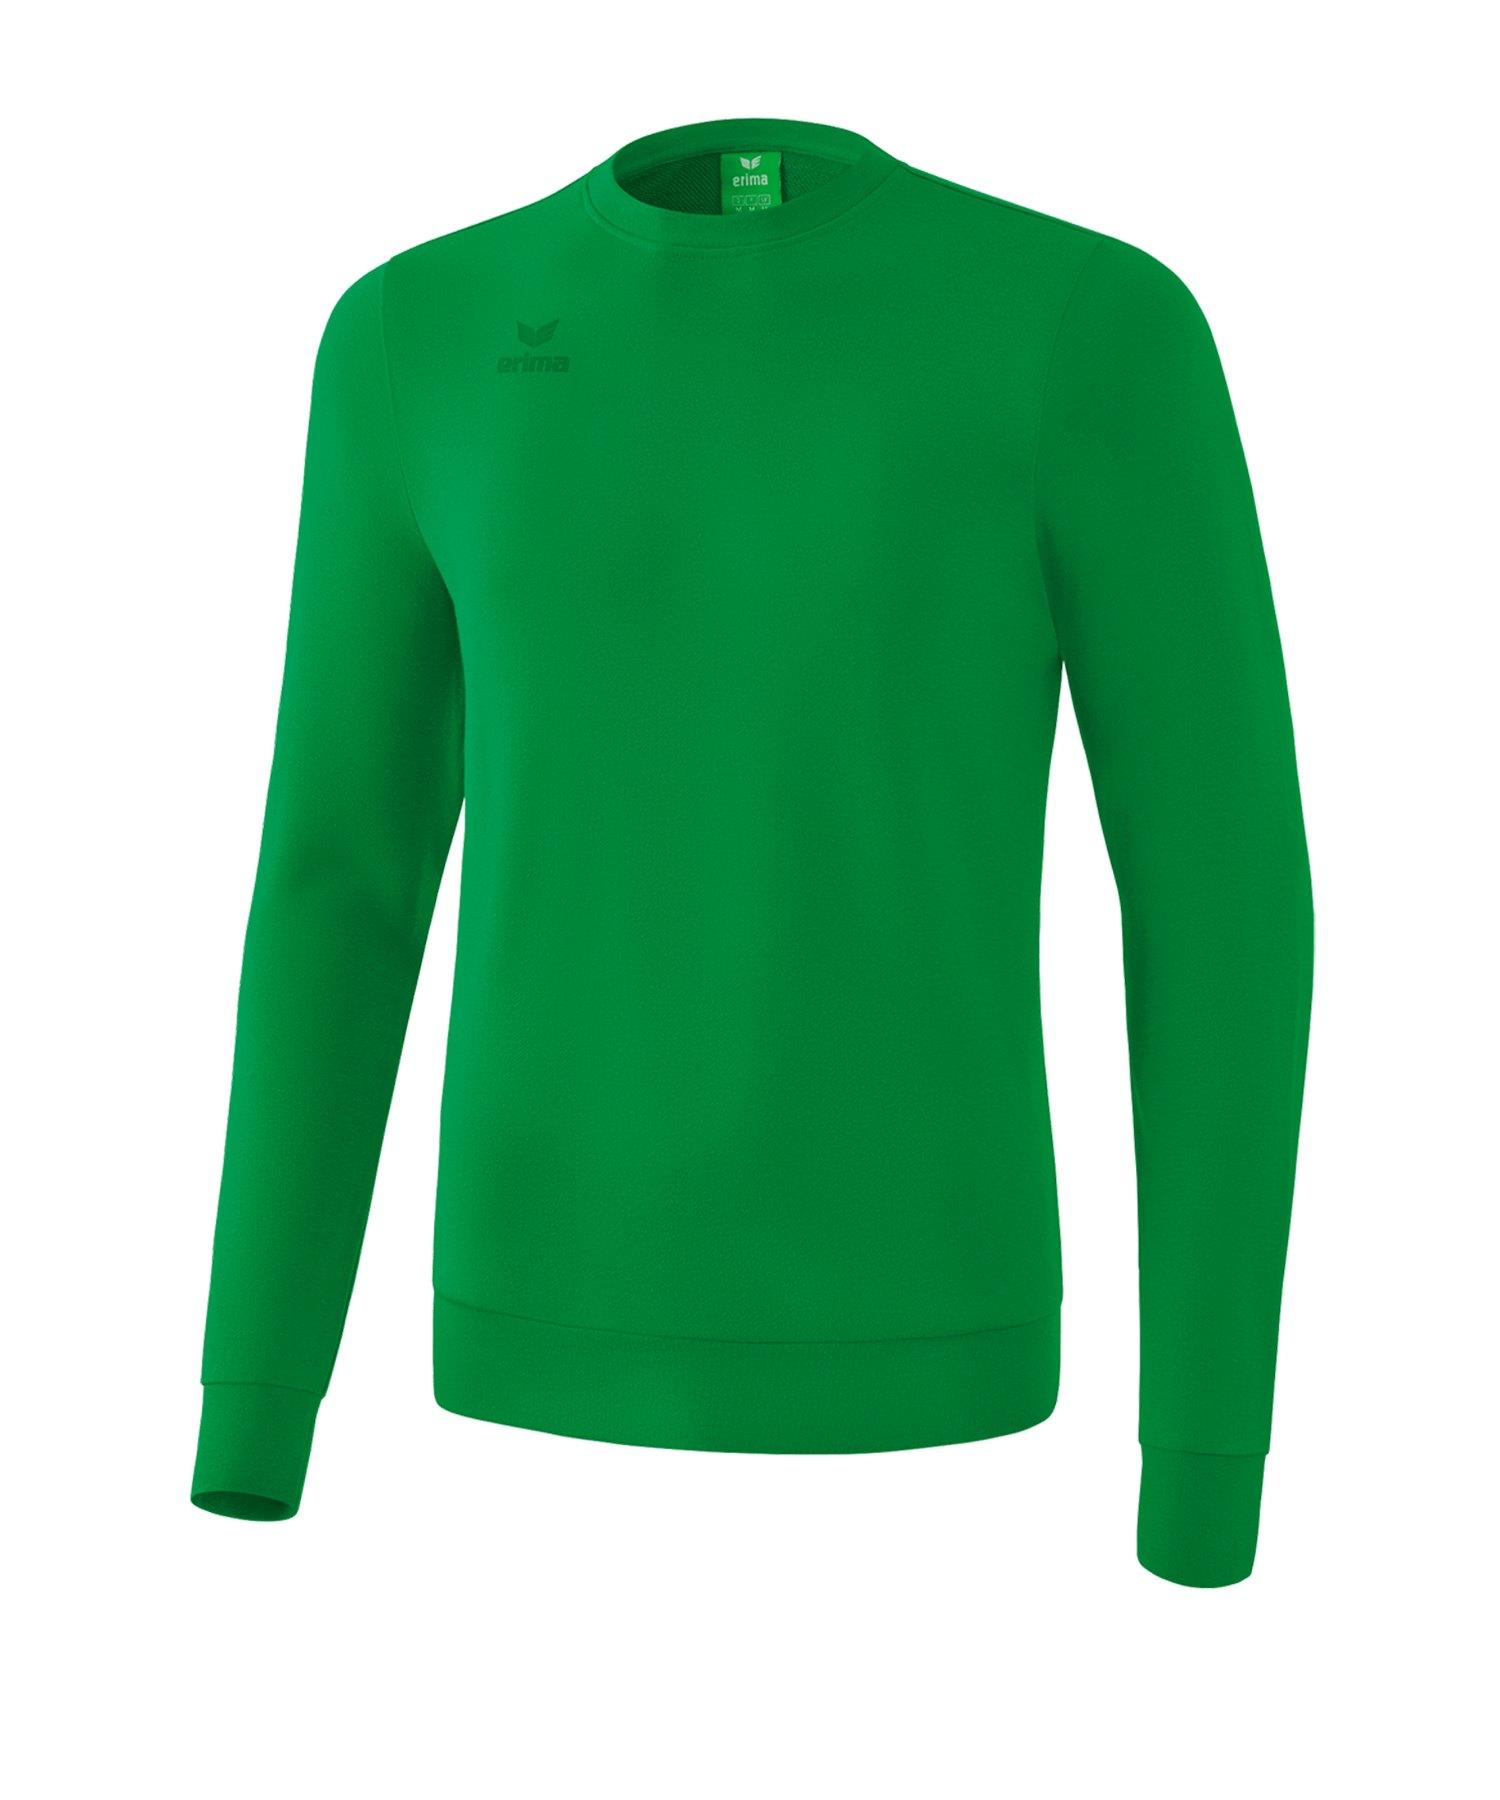 Erima Basic Sweatshirt Grün - gruen